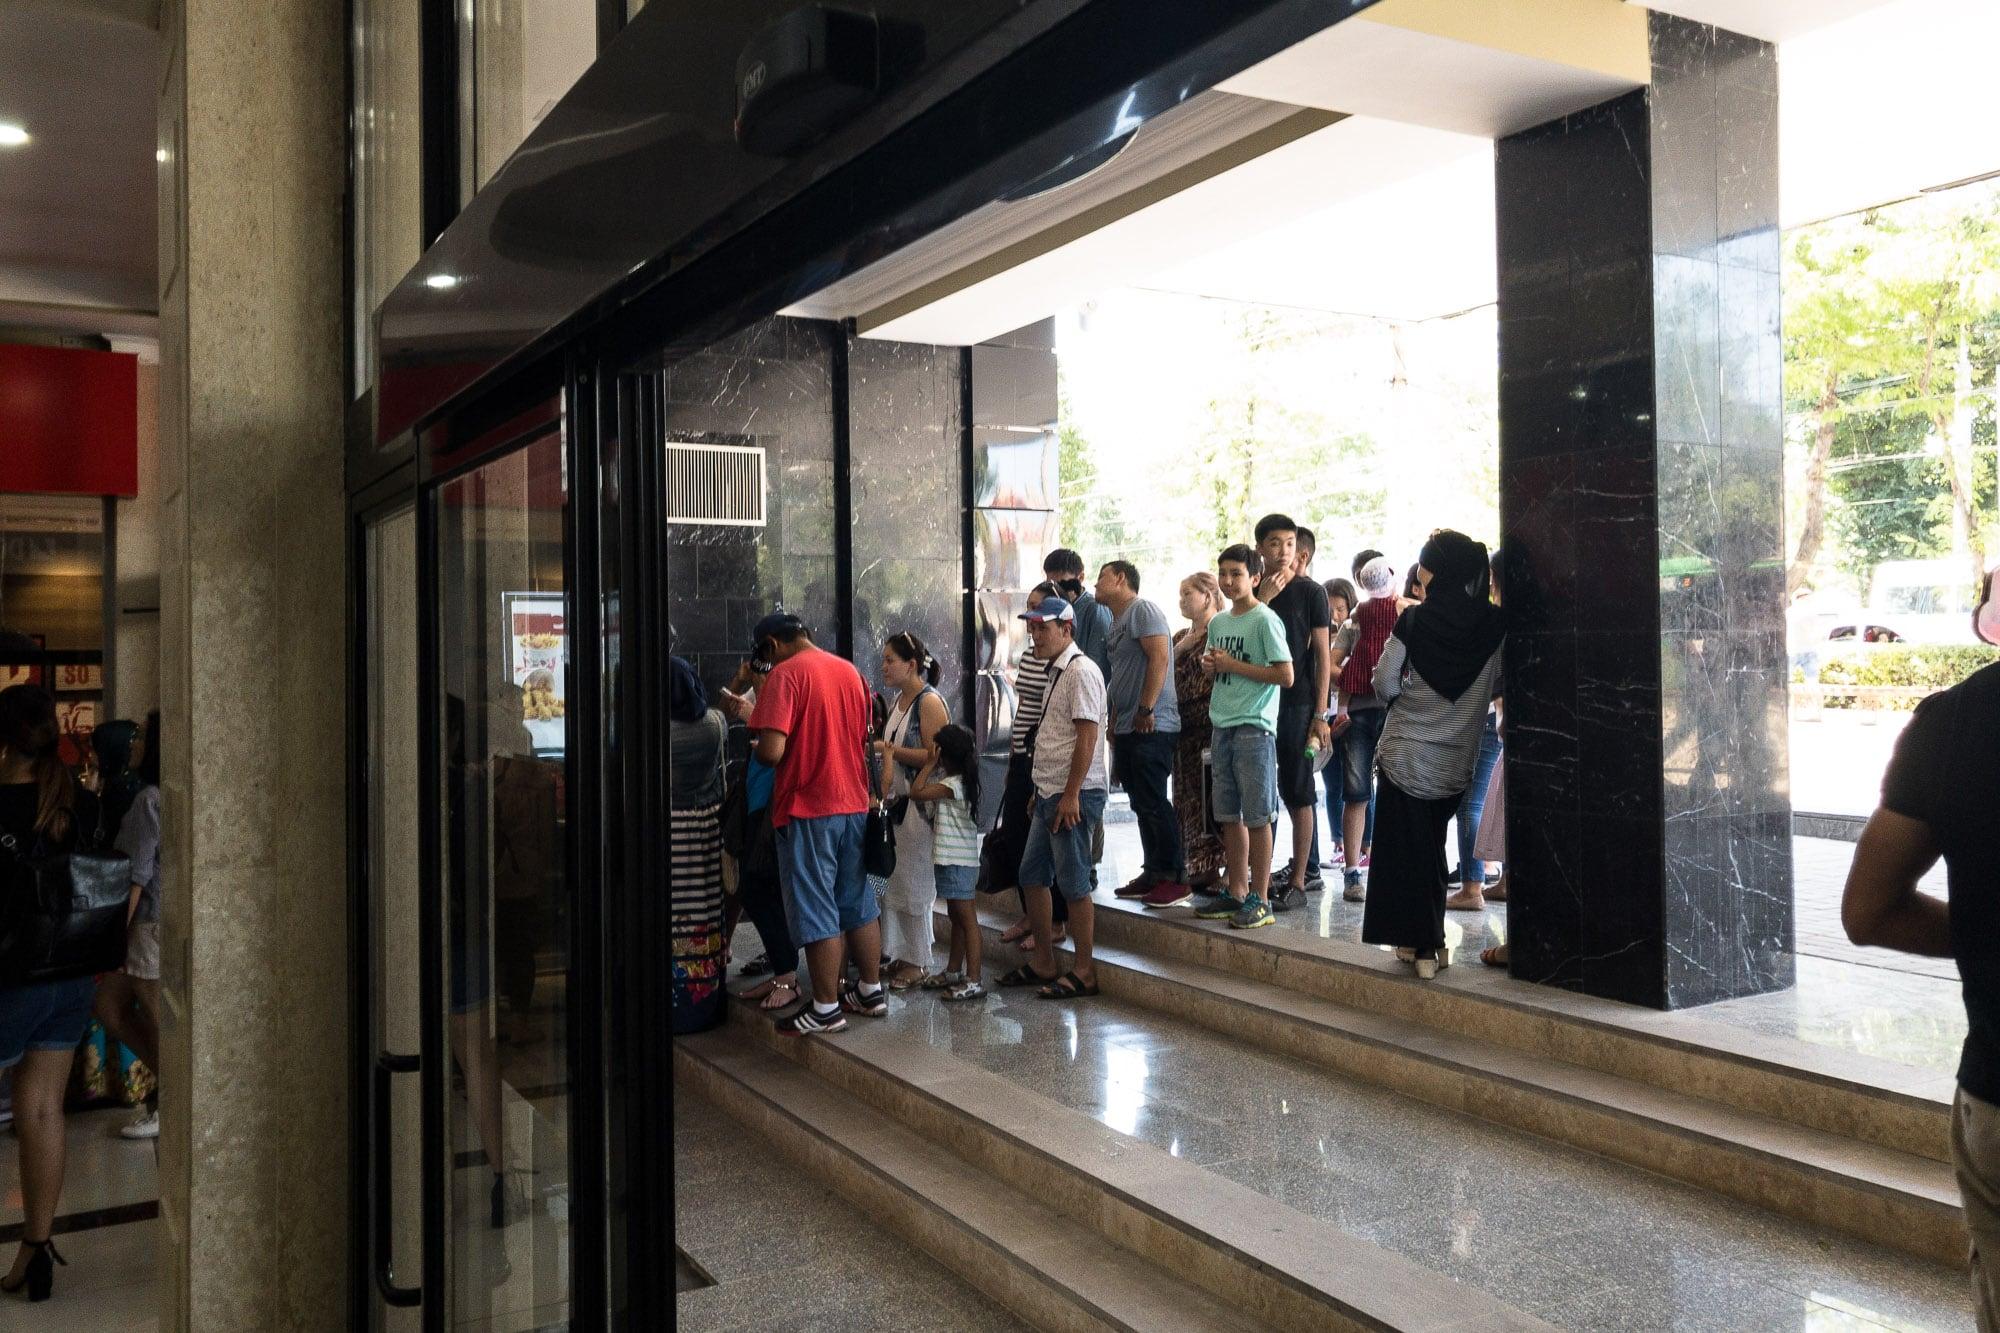 KFC opening in BishkeK